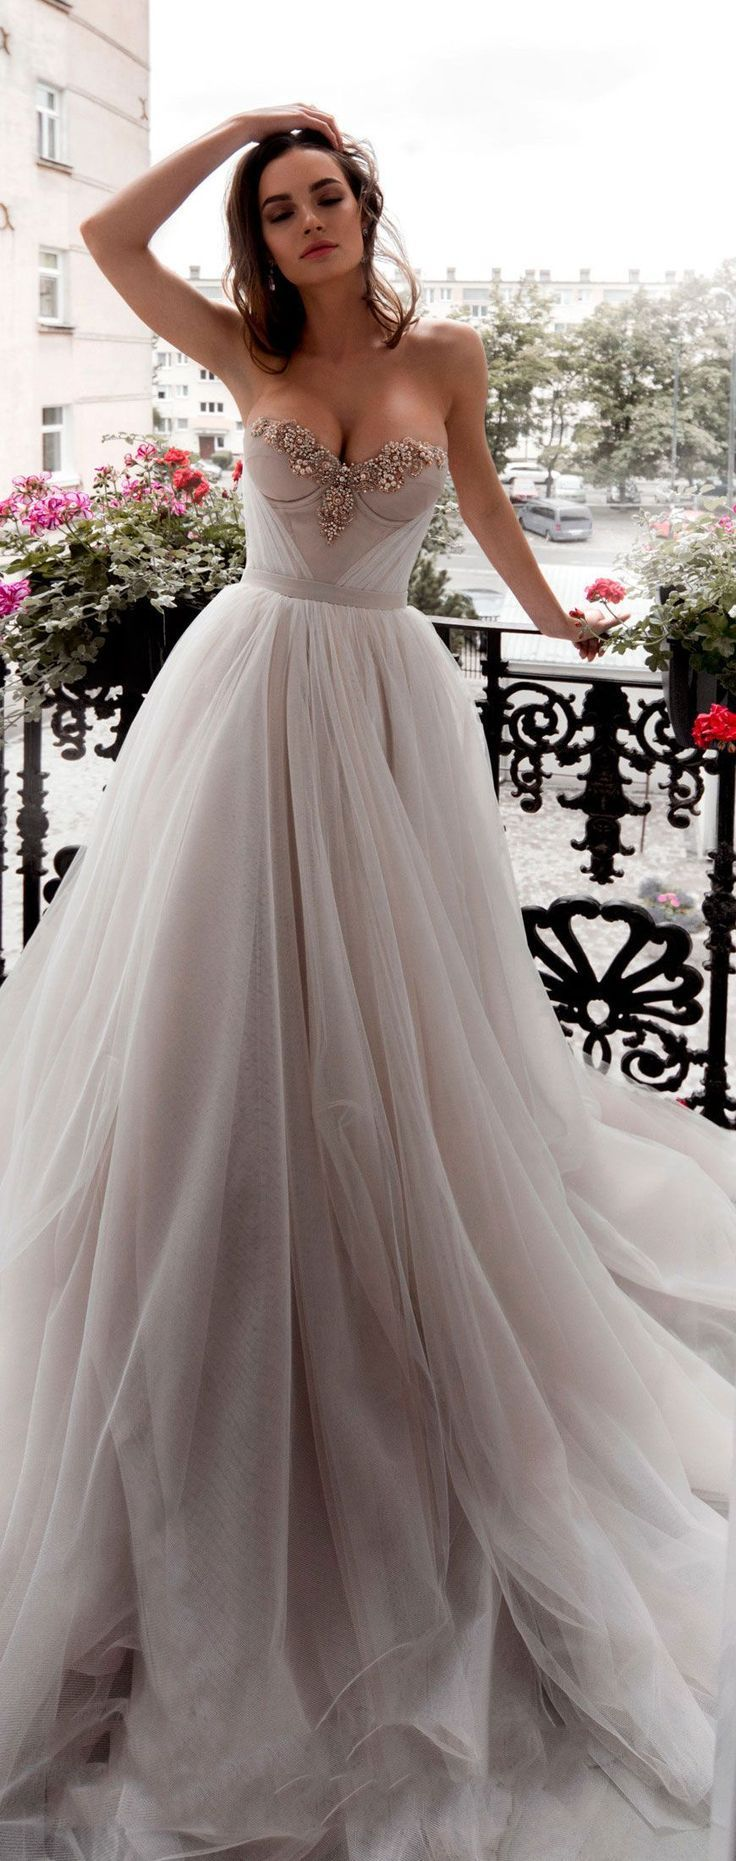 Blammo Biamo 2018 Wedding Dresses Sweetheart Prom Dress Wedding